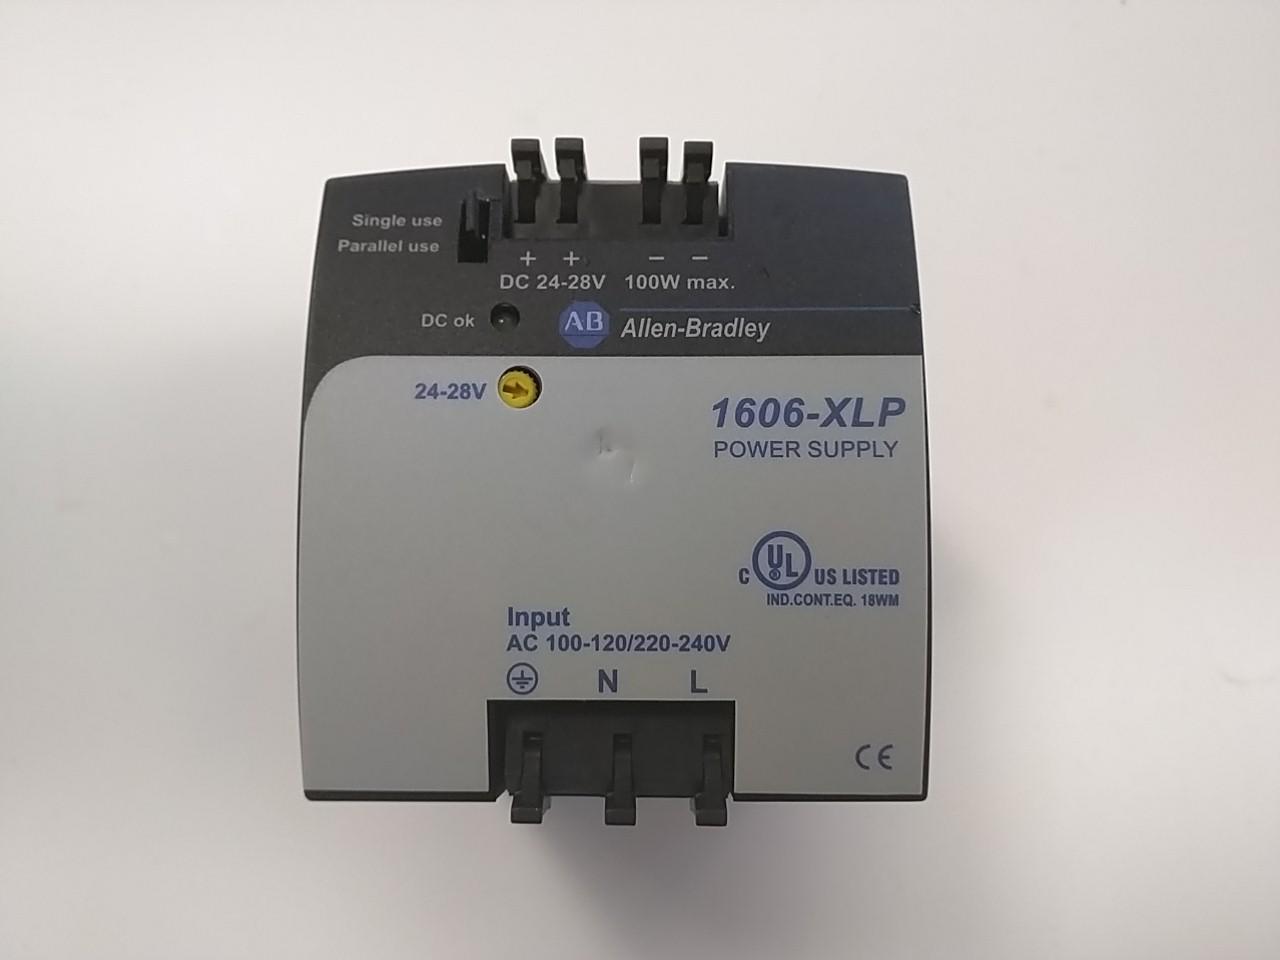 Allan bradley 1606 xlp power supply 2